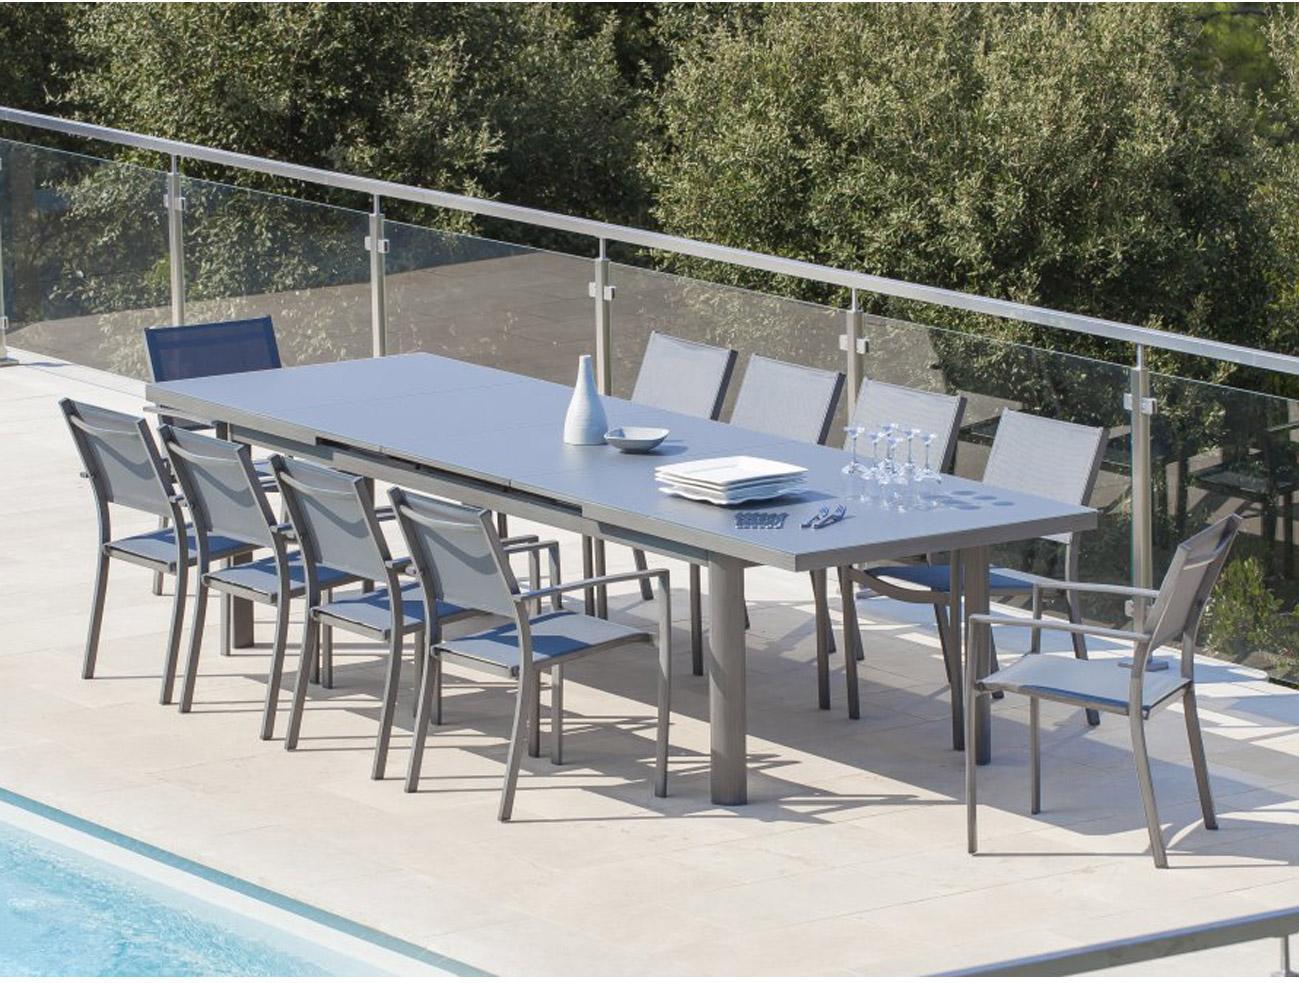 table de jardin magnolia rectangulaire gris 12 personnes leroy merlin. Black Bedroom Furniture Sets. Home Design Ideas